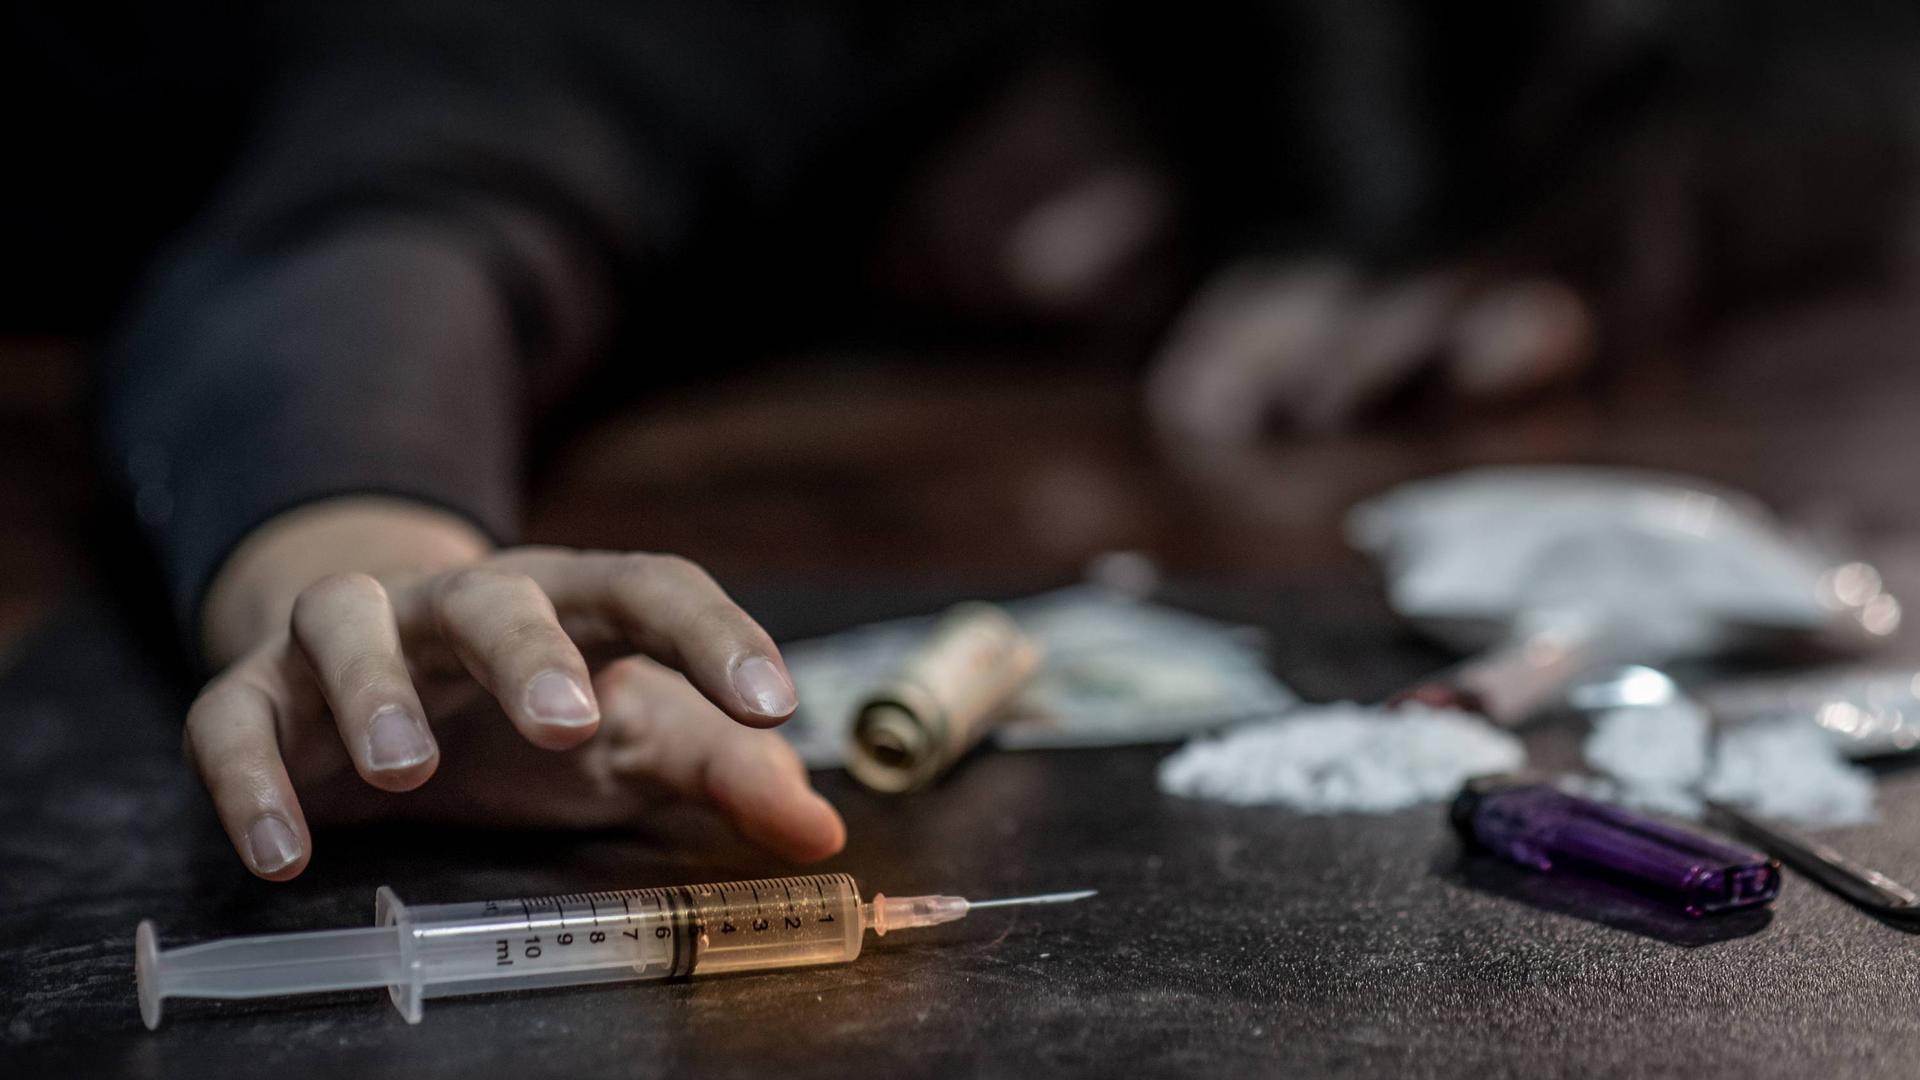 Symbolfoto zum Thema Drogen Sucht Spritze Süchtig Kokain Heroin . Fotobeschreibung: Male junkie hand trying to grab injection syringe of cooked heroine. Hard drug overdose and addiction concept.